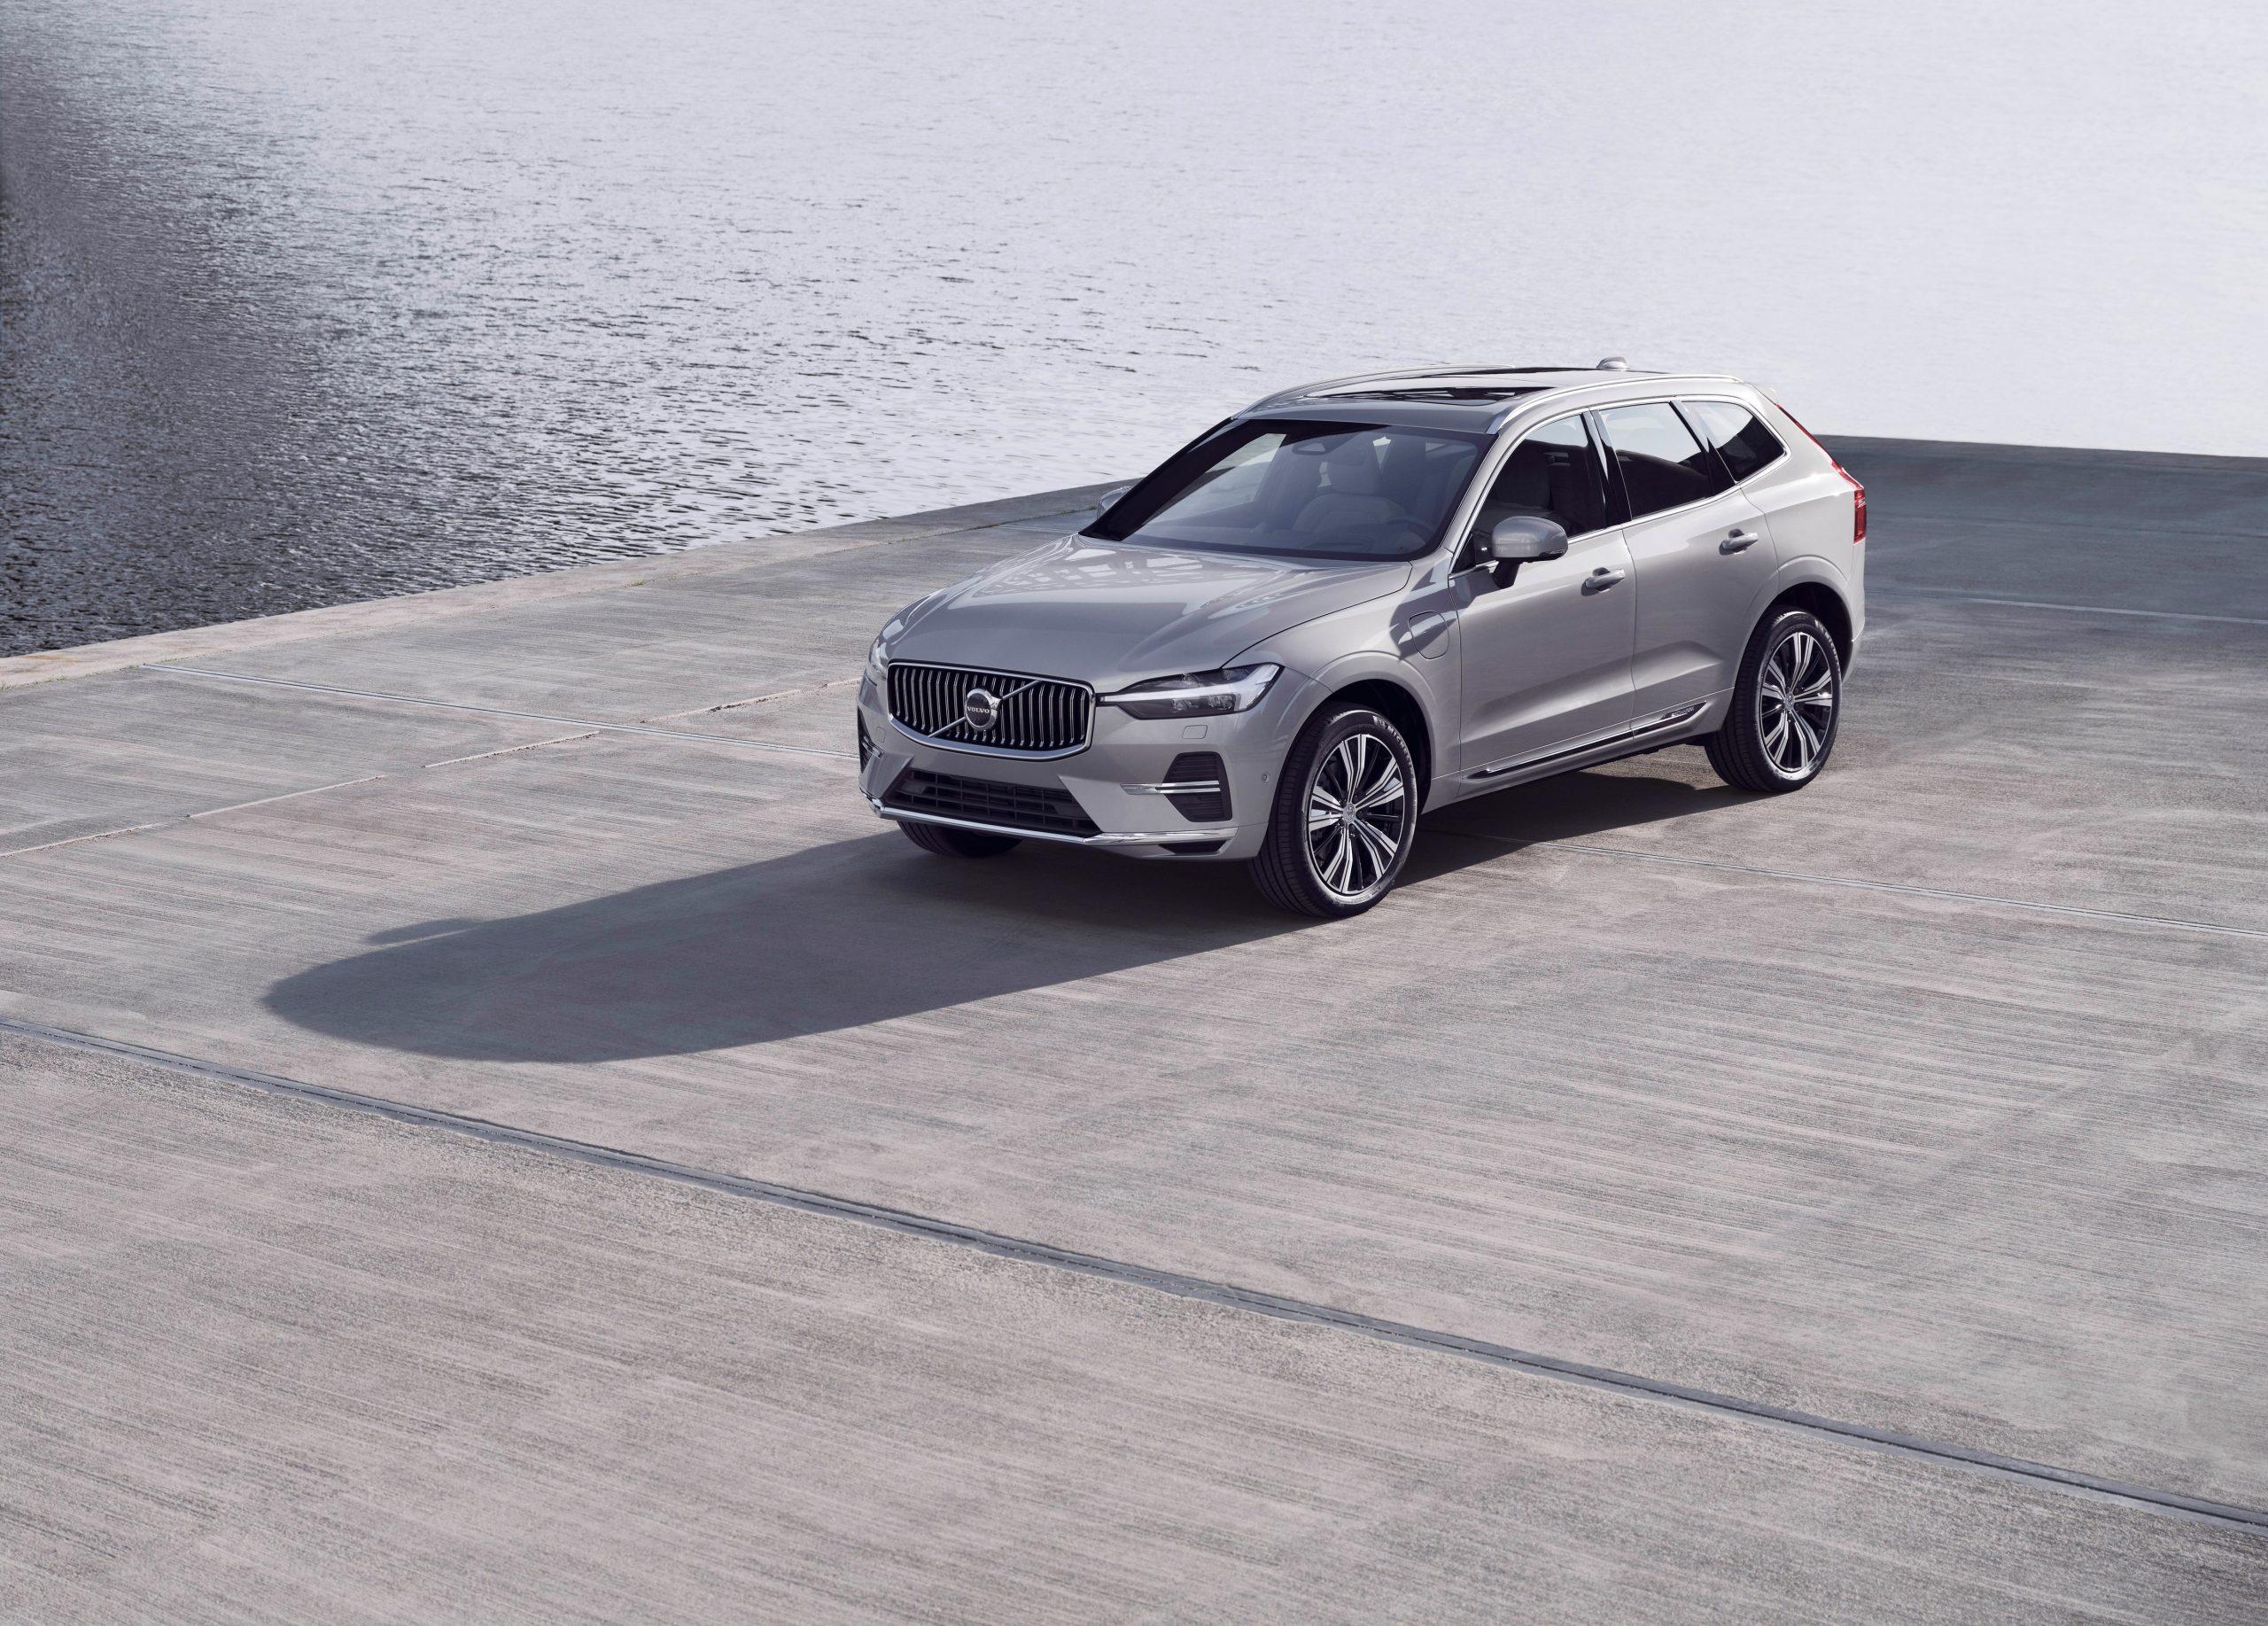 279258 XC60 Model Year 2022 scaled H Volvo έσπασε ρεκόρ όλων των εποχών σε πωλήσεις! Electric cars, Volvo, Volvo Car Hellas, Volvo Cars, Volvo XC40, Volvo XC60, Volvo XC90, αγορά, πωλήσεις, πωλήσεις αυτοκινήτων, υβριδικό